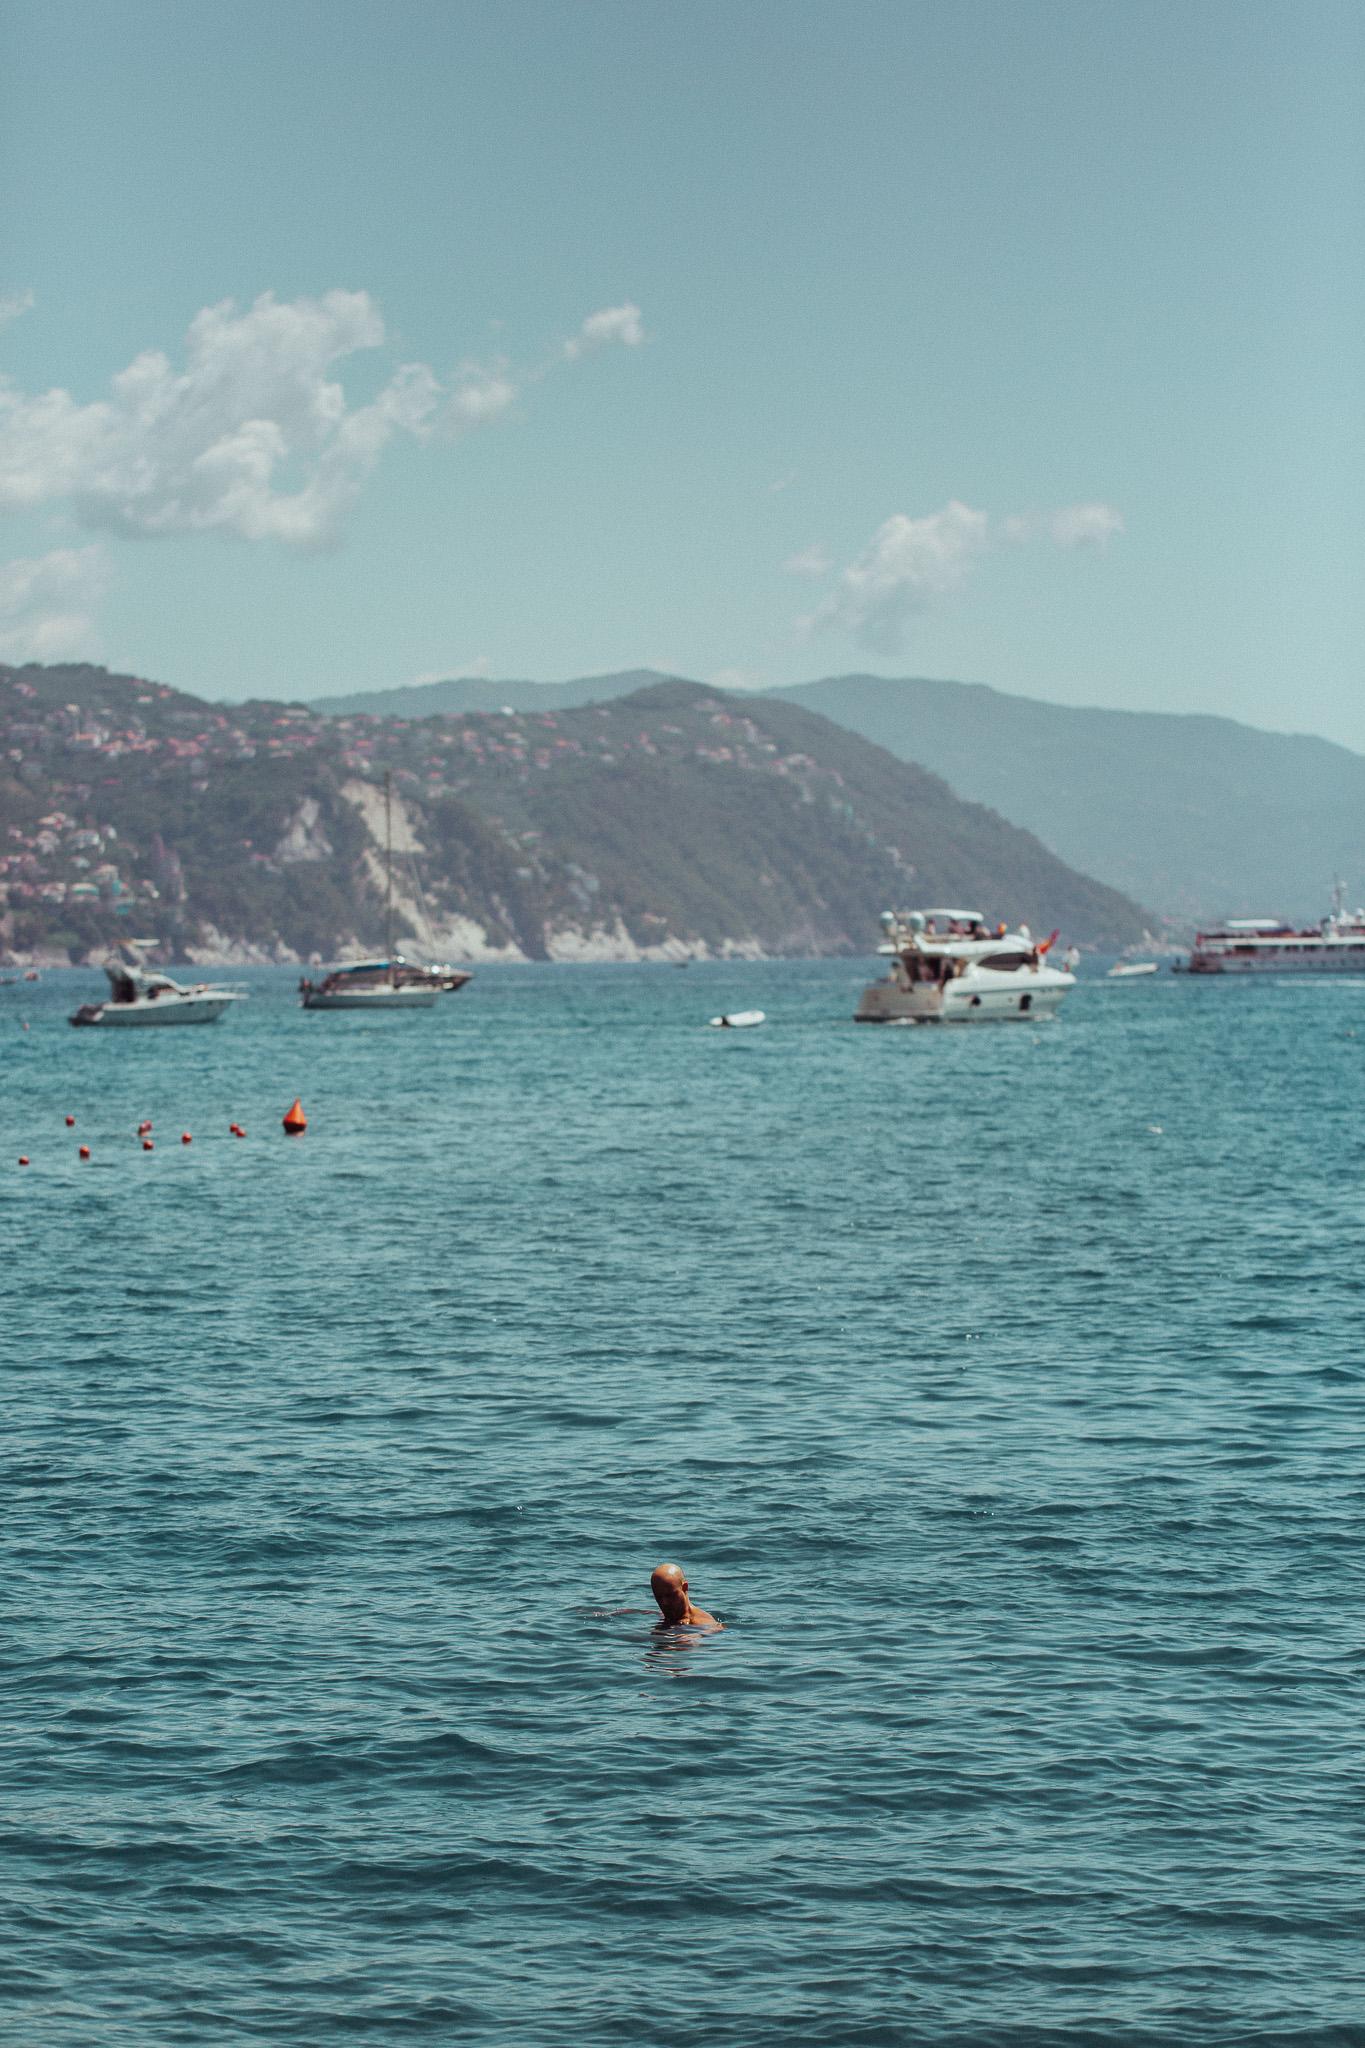 190807-Rapallo-3816.jpg